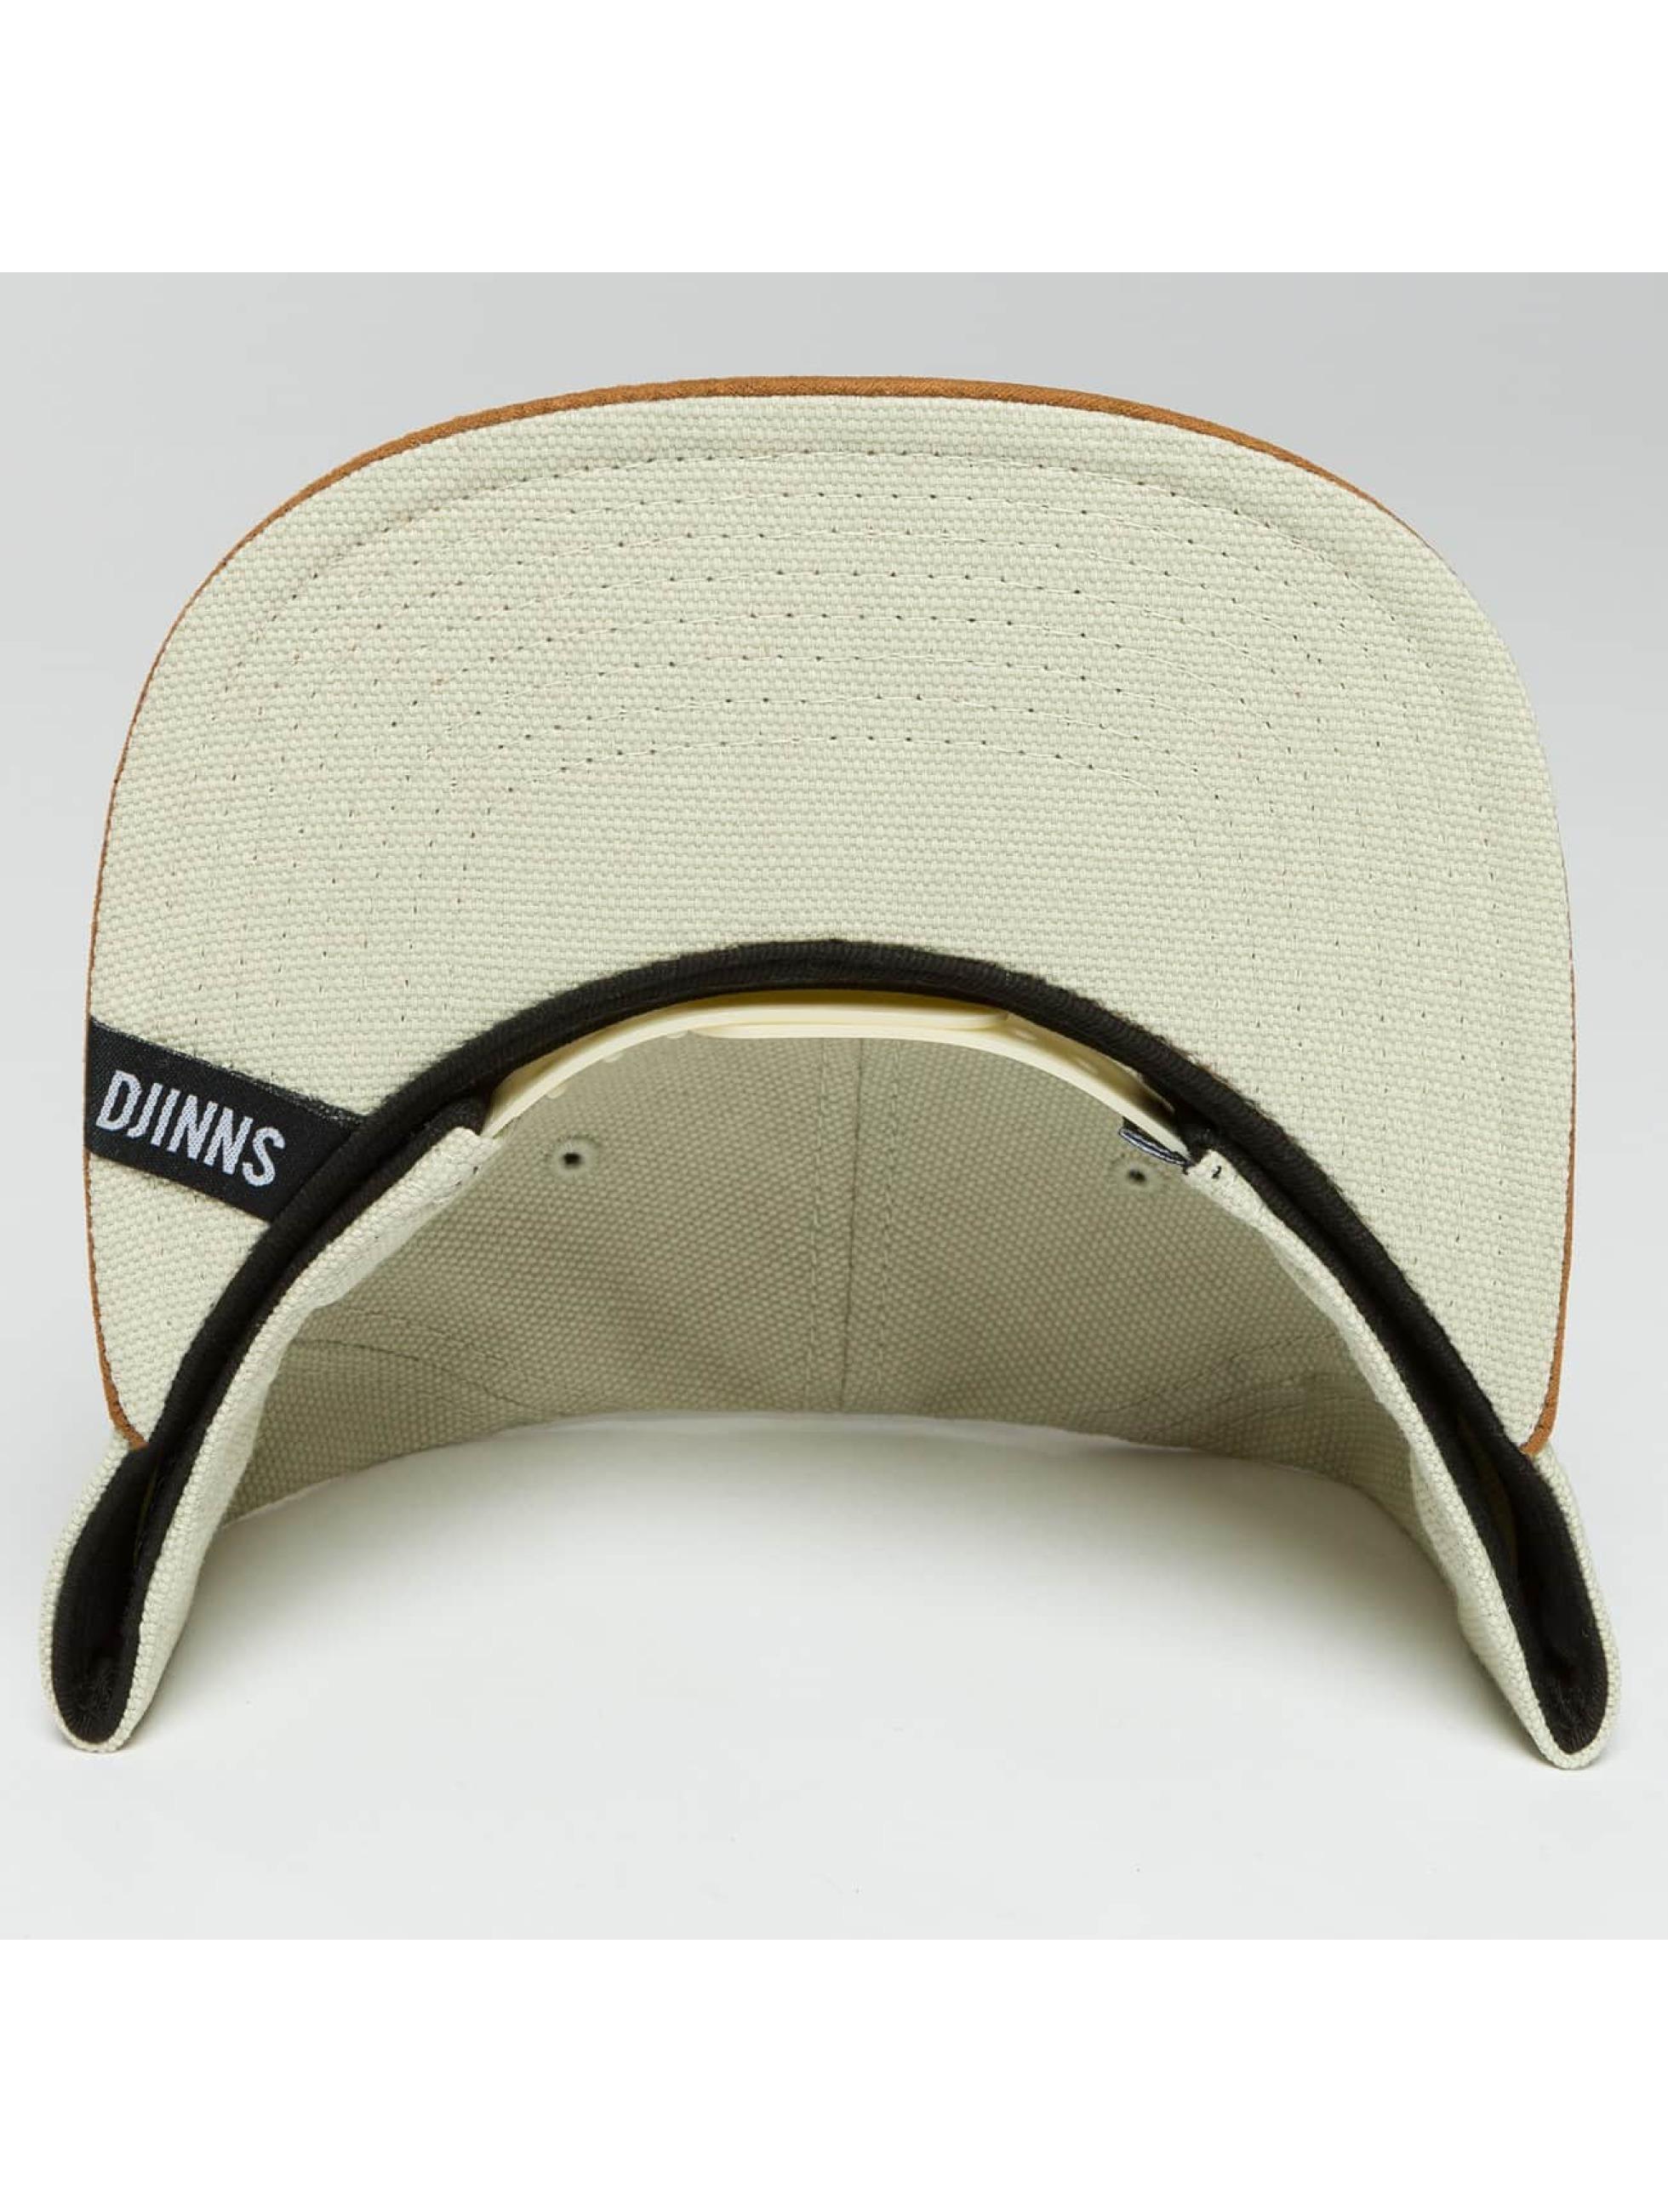 Djinns Casquette Snapback & Strapback 6 Panel Light Canvas beige